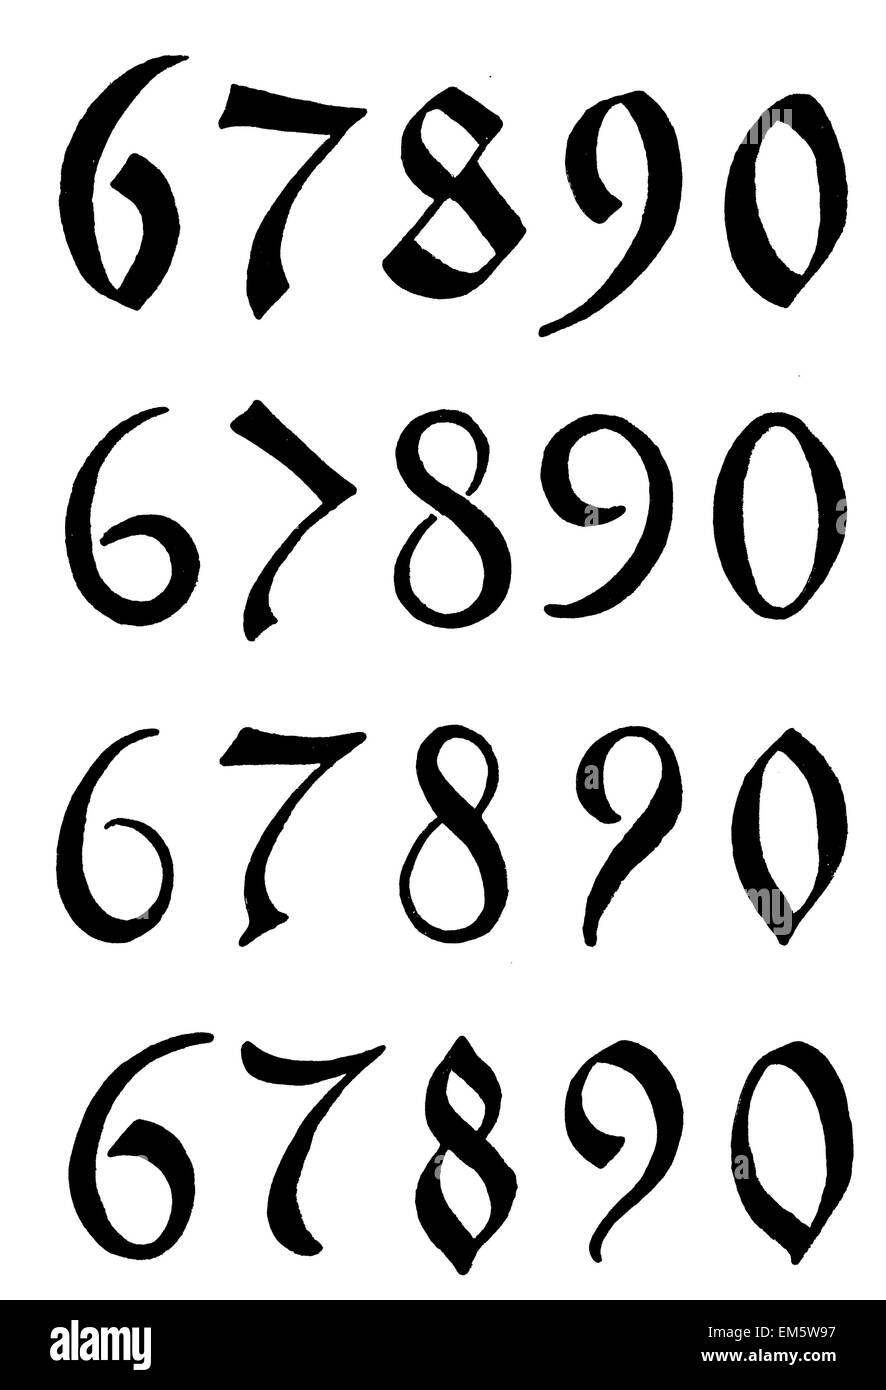 Digits , numbers, German , beaten metal , 1520-1598 - Stock Image